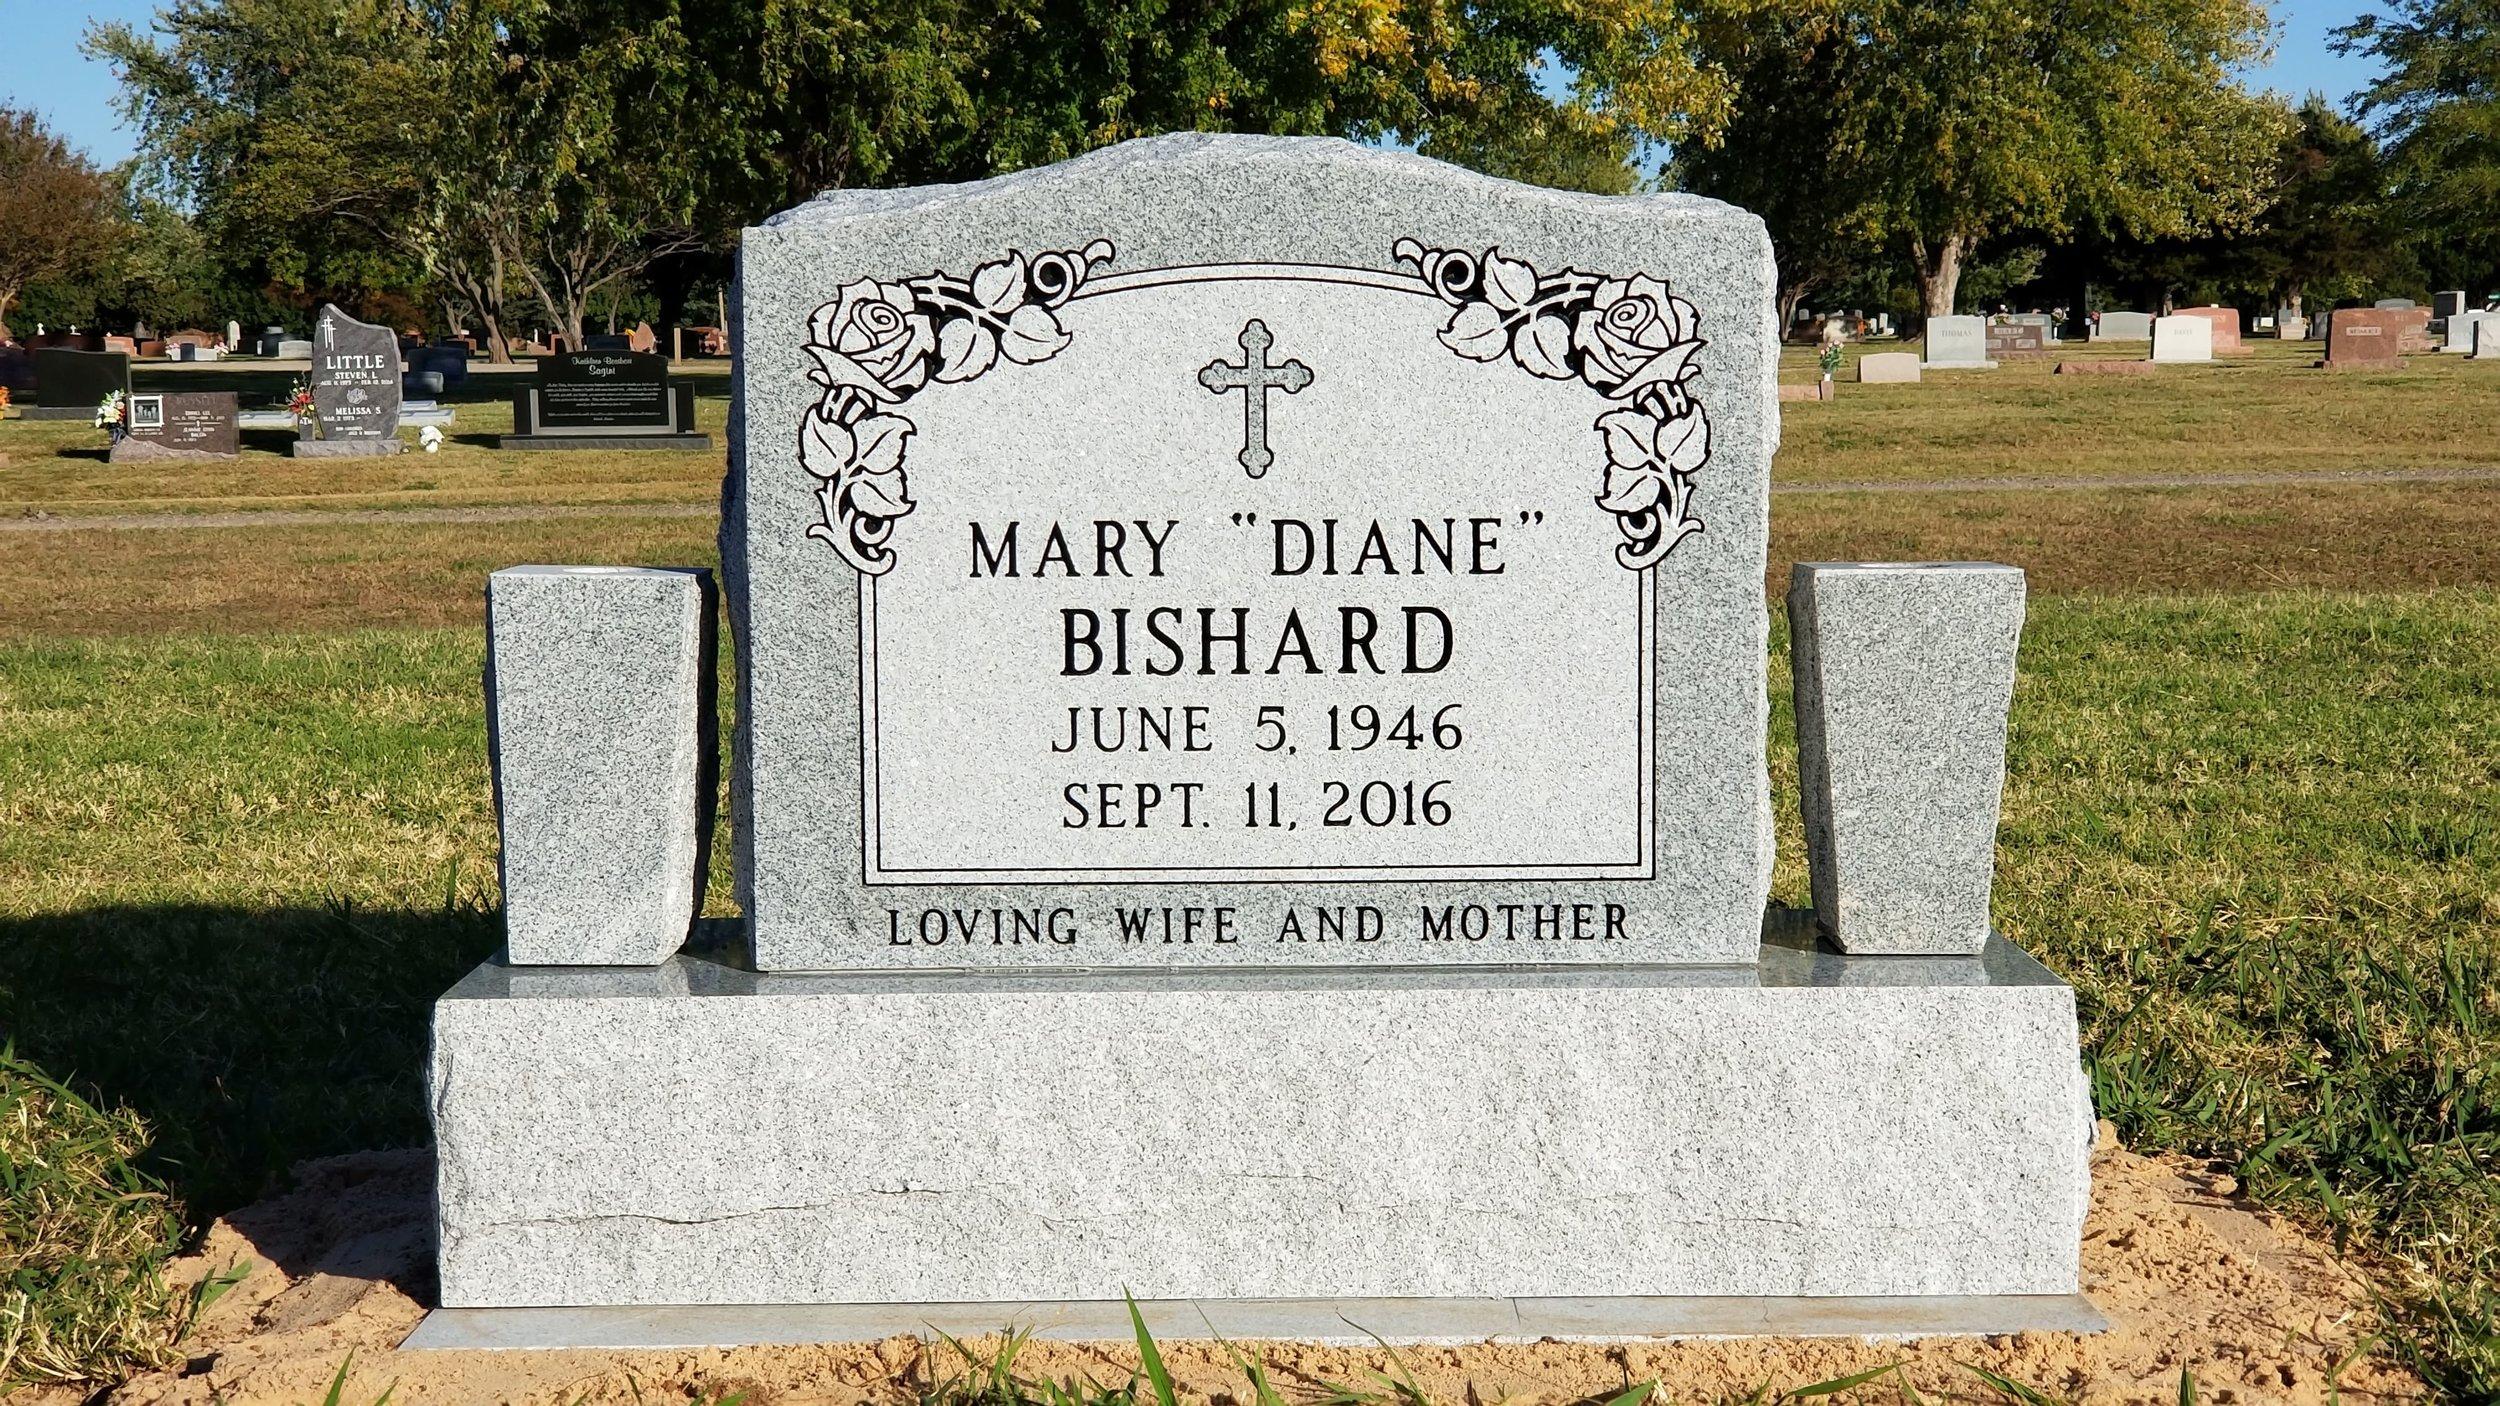 6. Gracelawn Cemetery, Edmond, Oklahoma